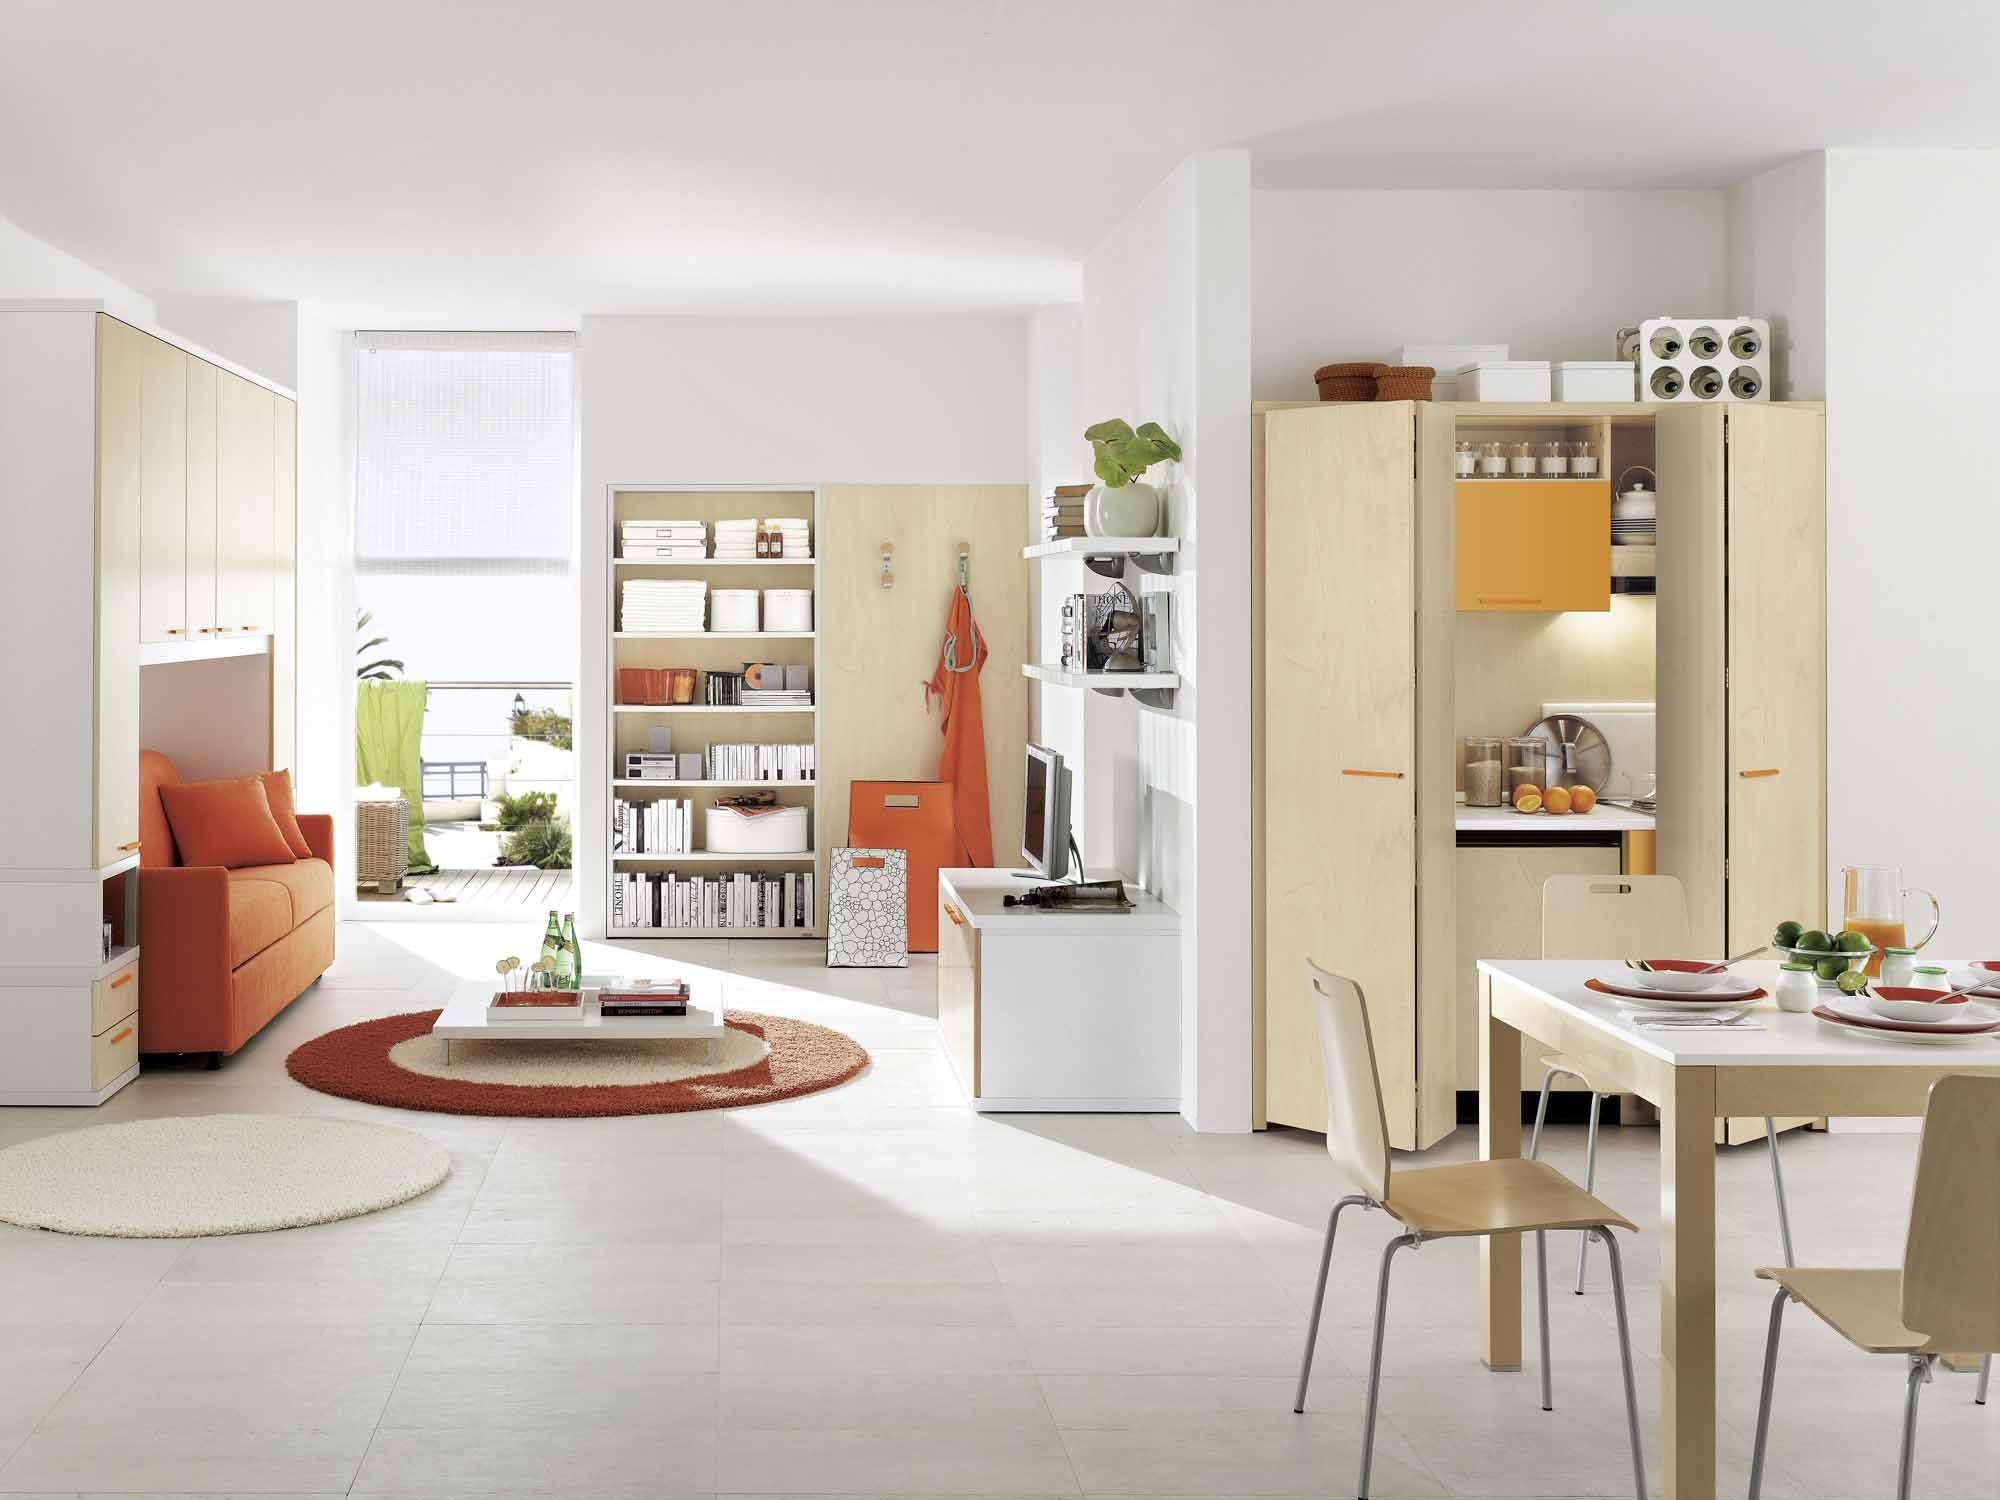 Doimo cityline soluzioni abitative - Doimo cucine spa ...